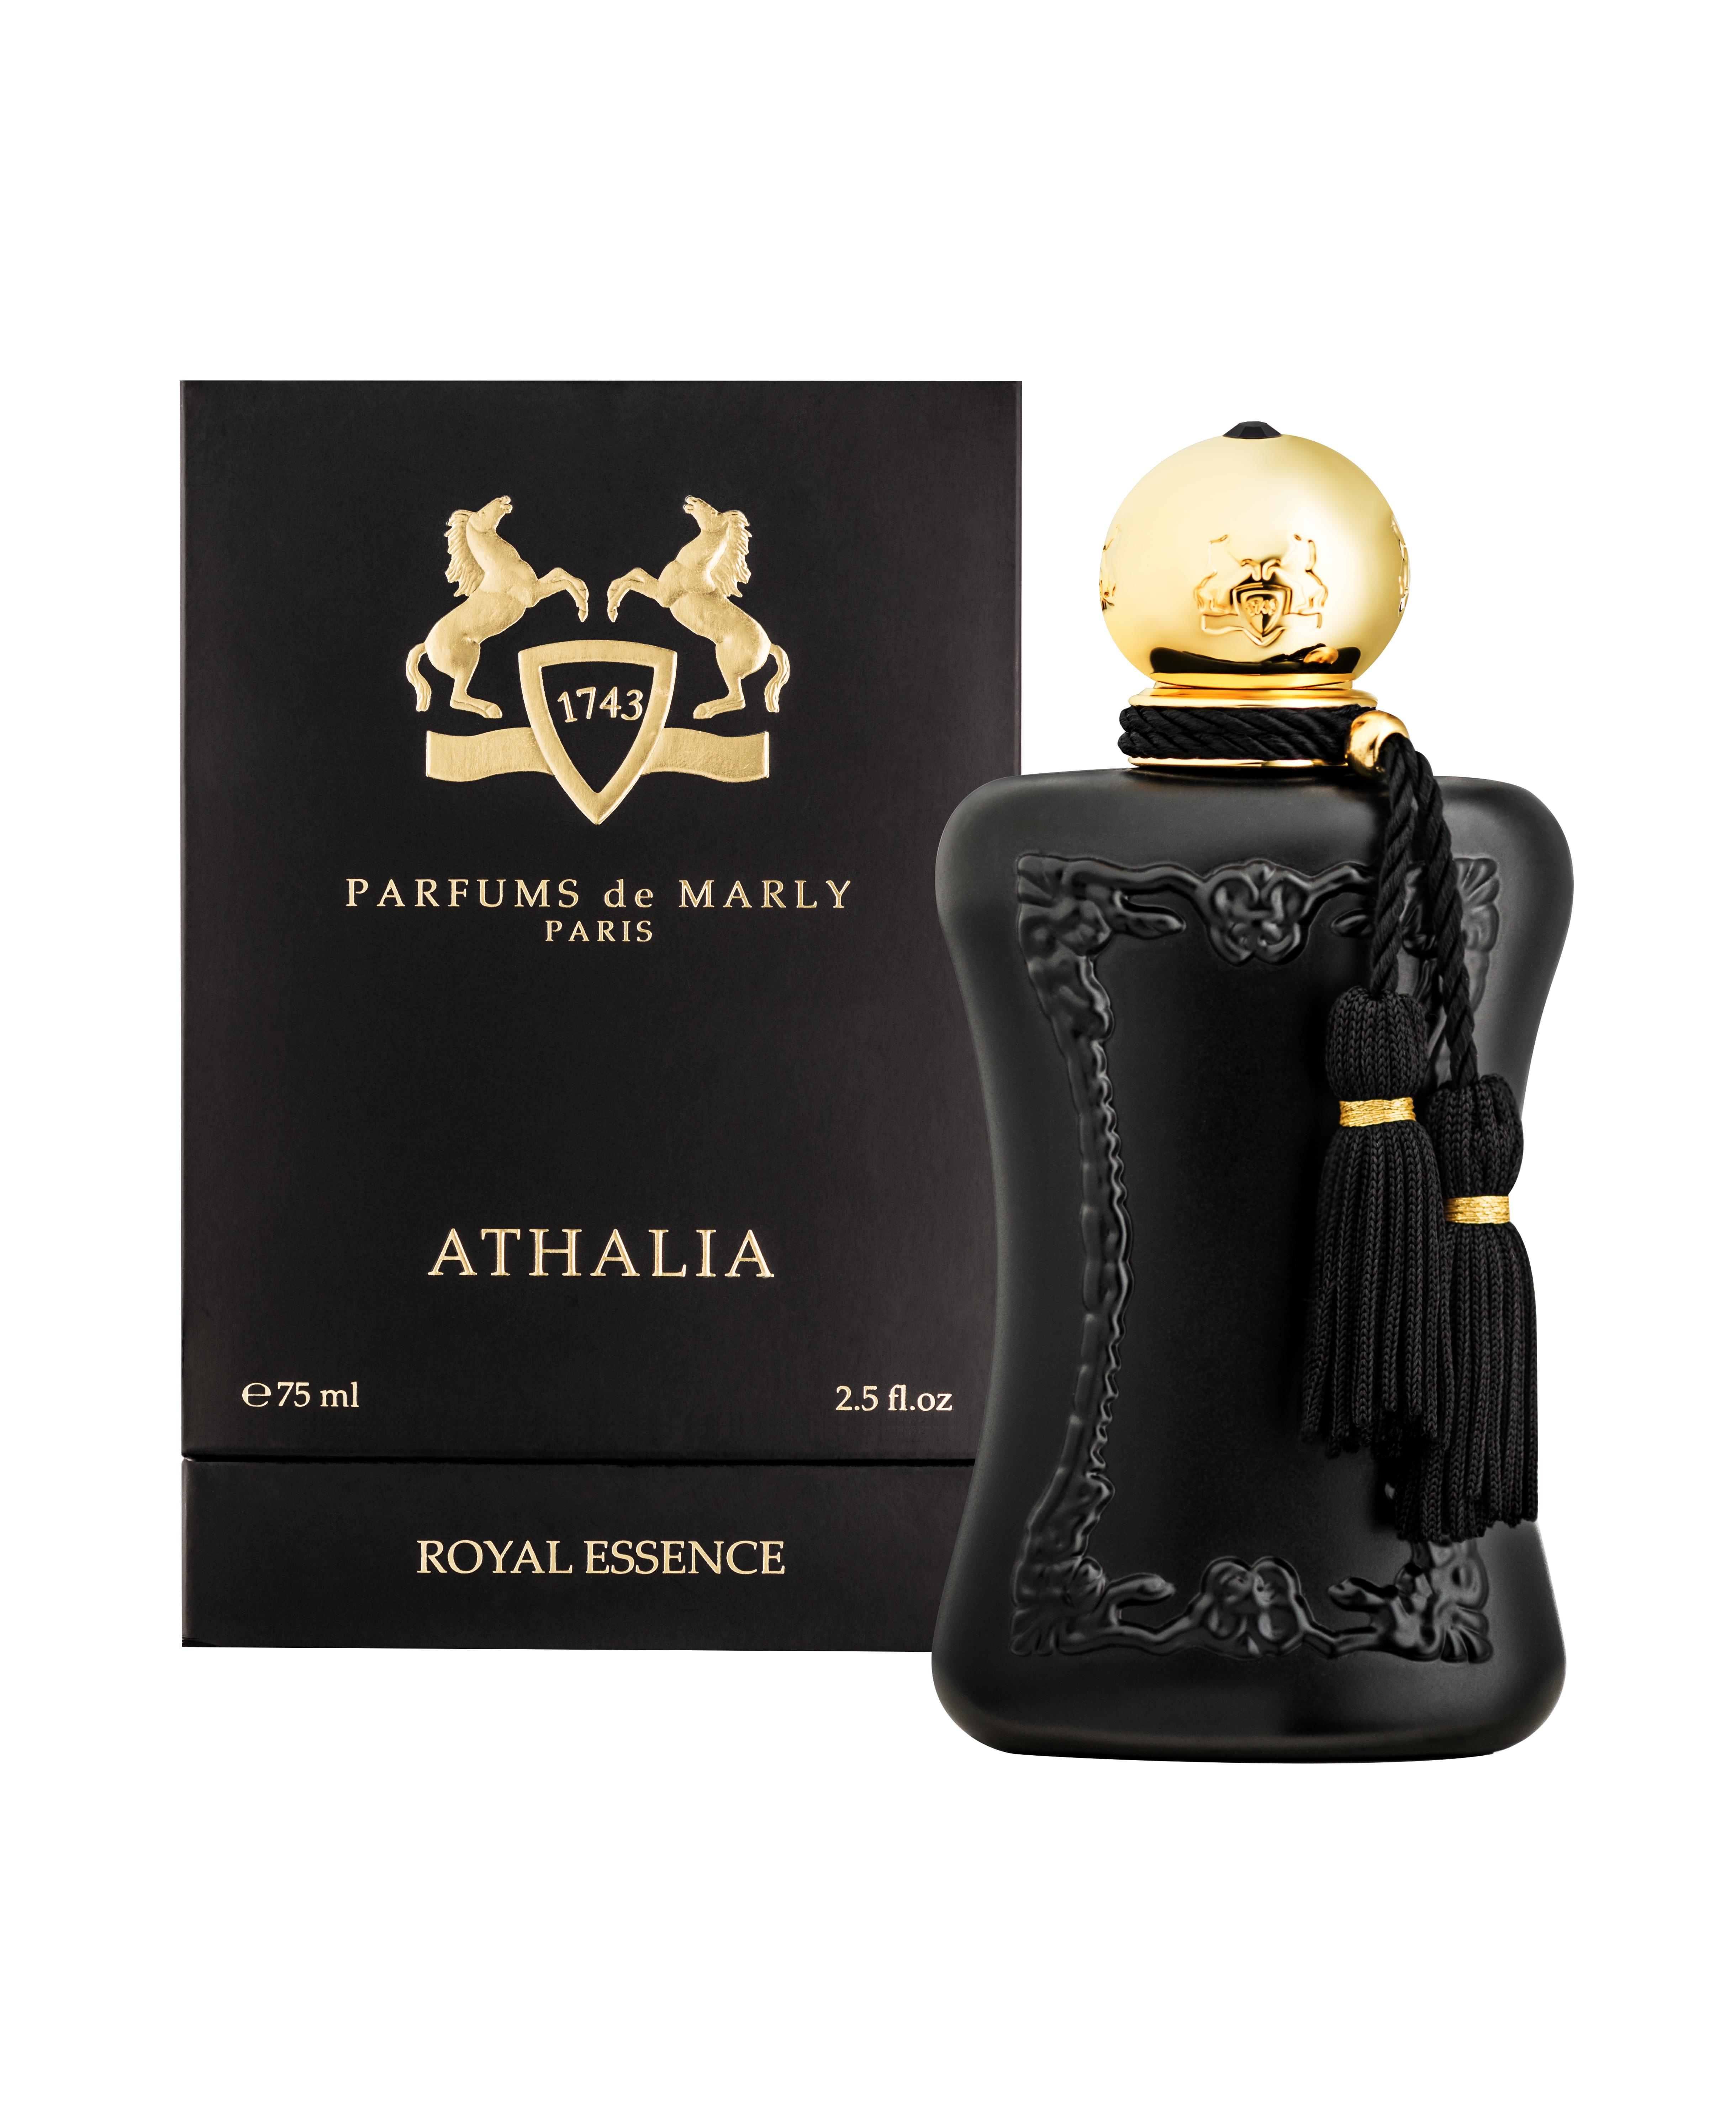 Parfums de Marly Athalia EDP, 75 ml